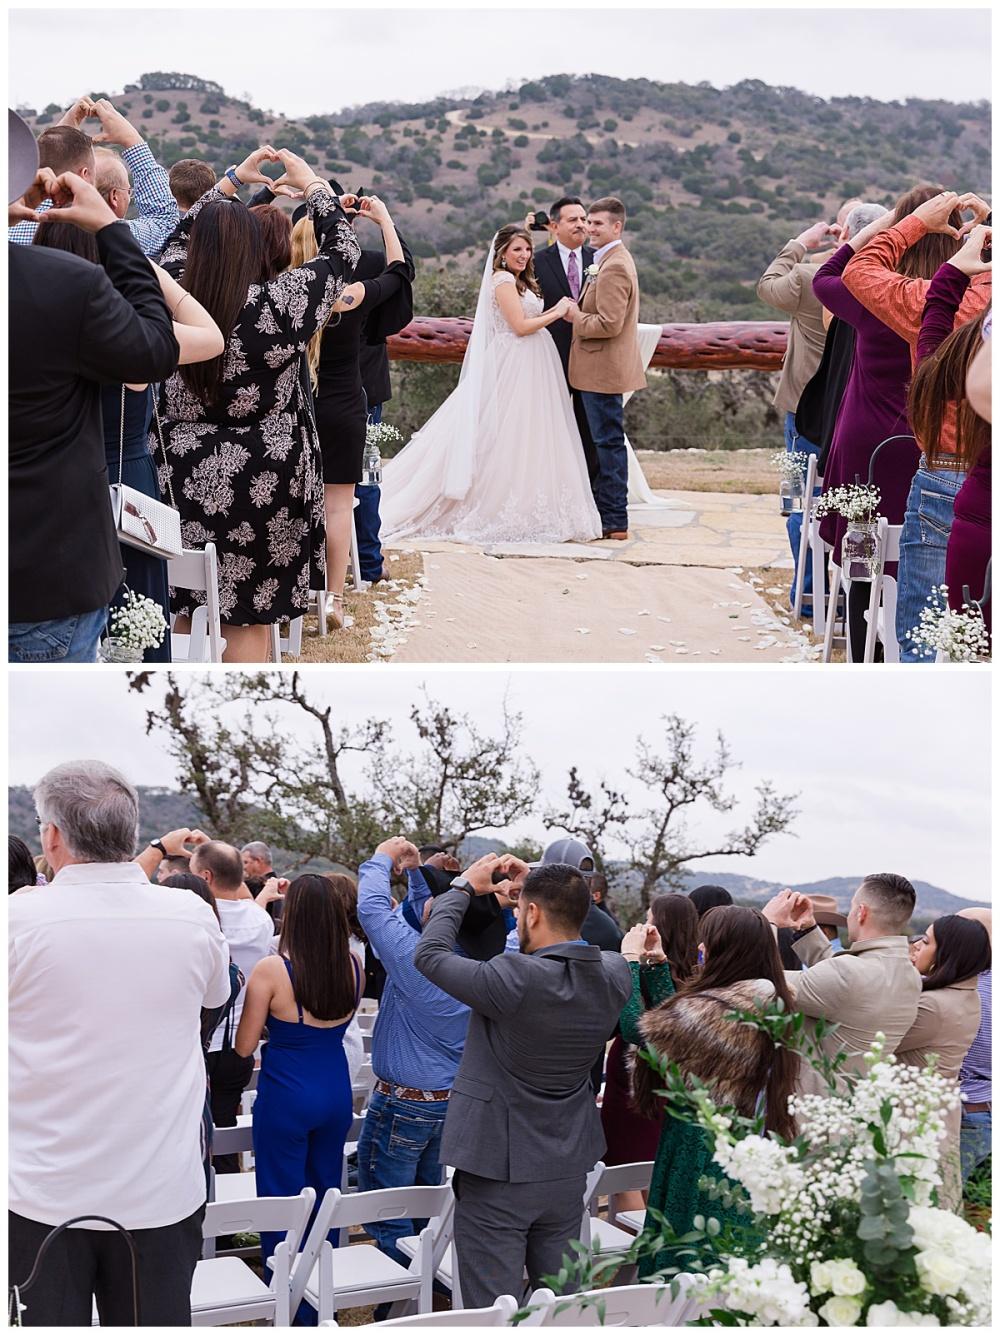 Wedding-Photographer-Texas-Hill-Country-Happy-H-Ranch-Comfor-Texas-Carly-Barton-Photography_0029.jpg